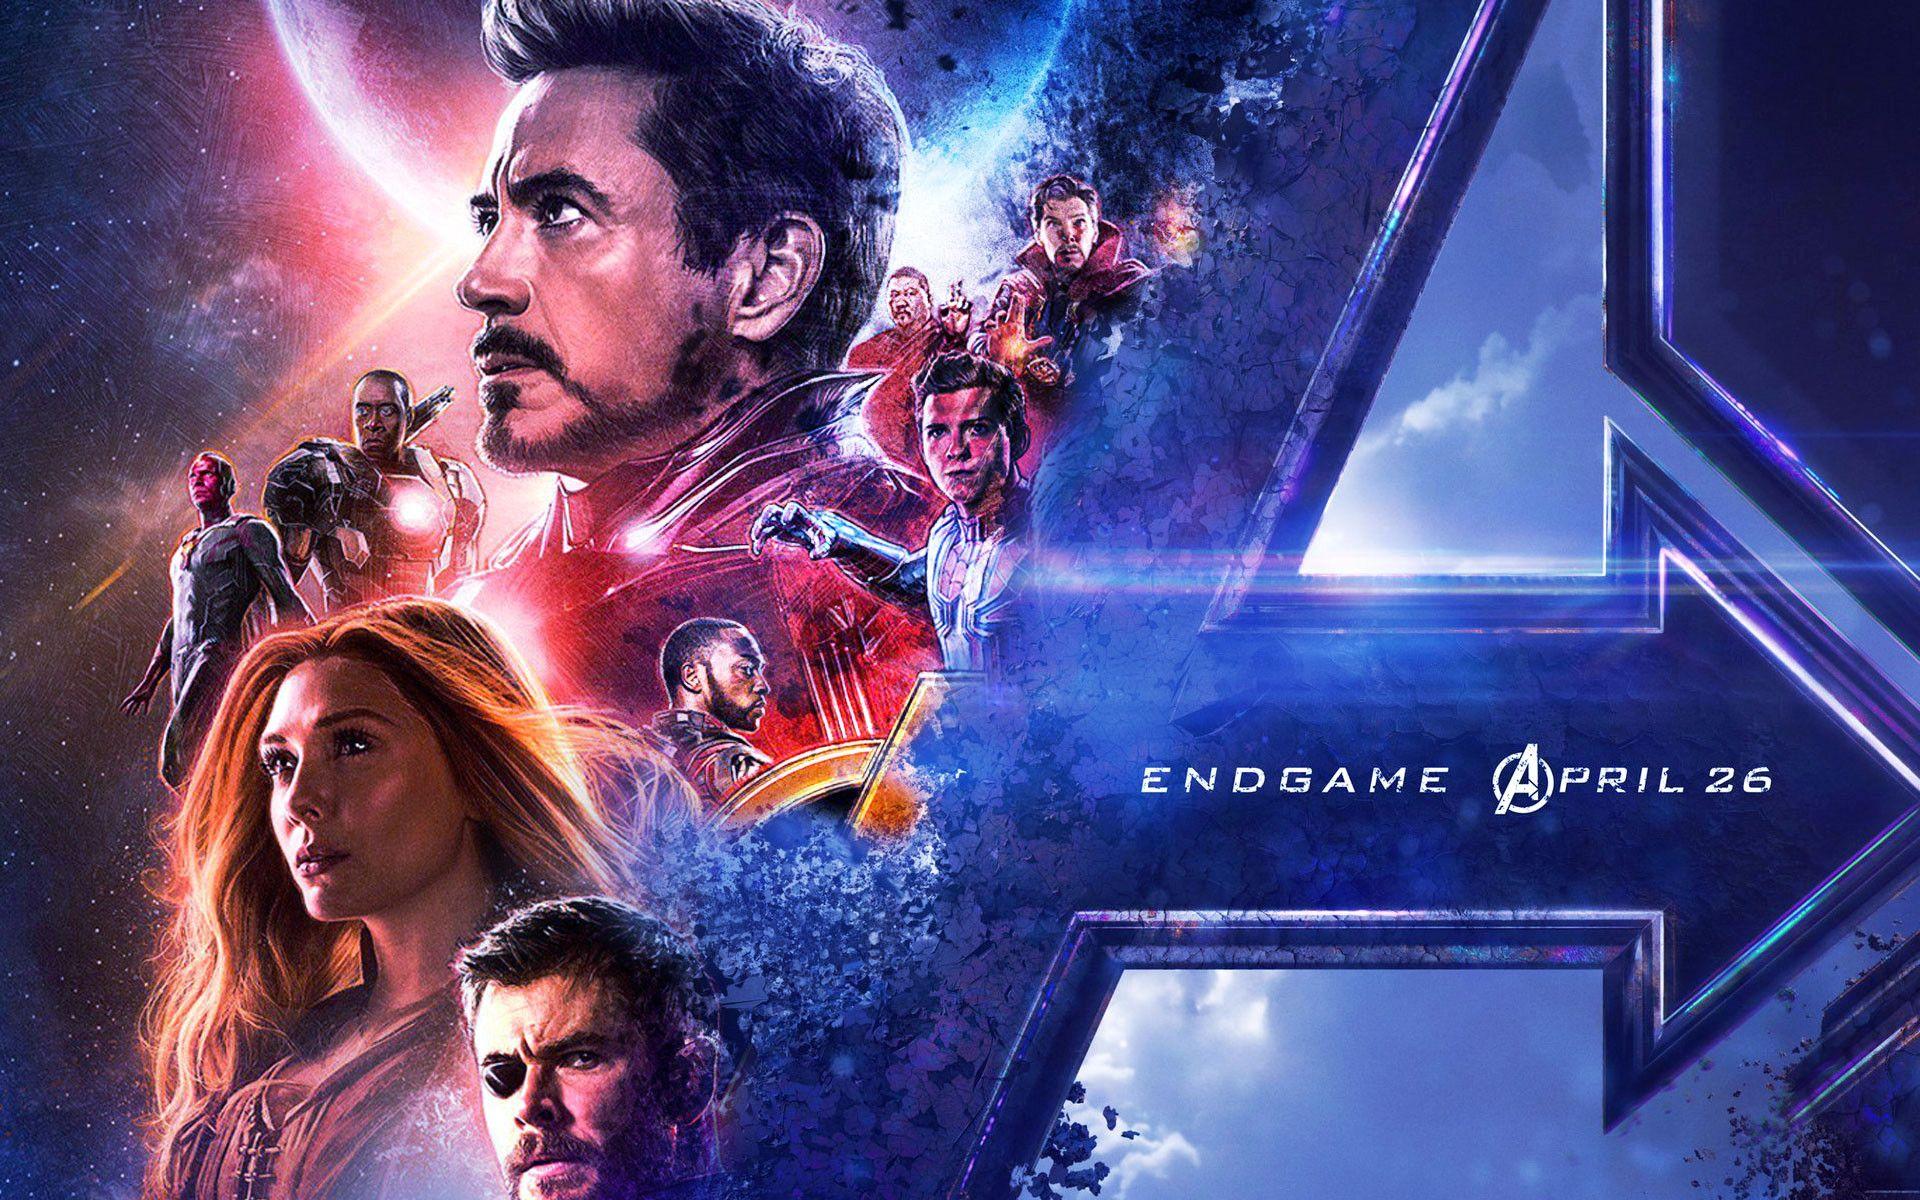 Awesome Avengers Endgame 2019 Desktop Wallpapers Hd Best Movie Posters Avengers Avengers Film